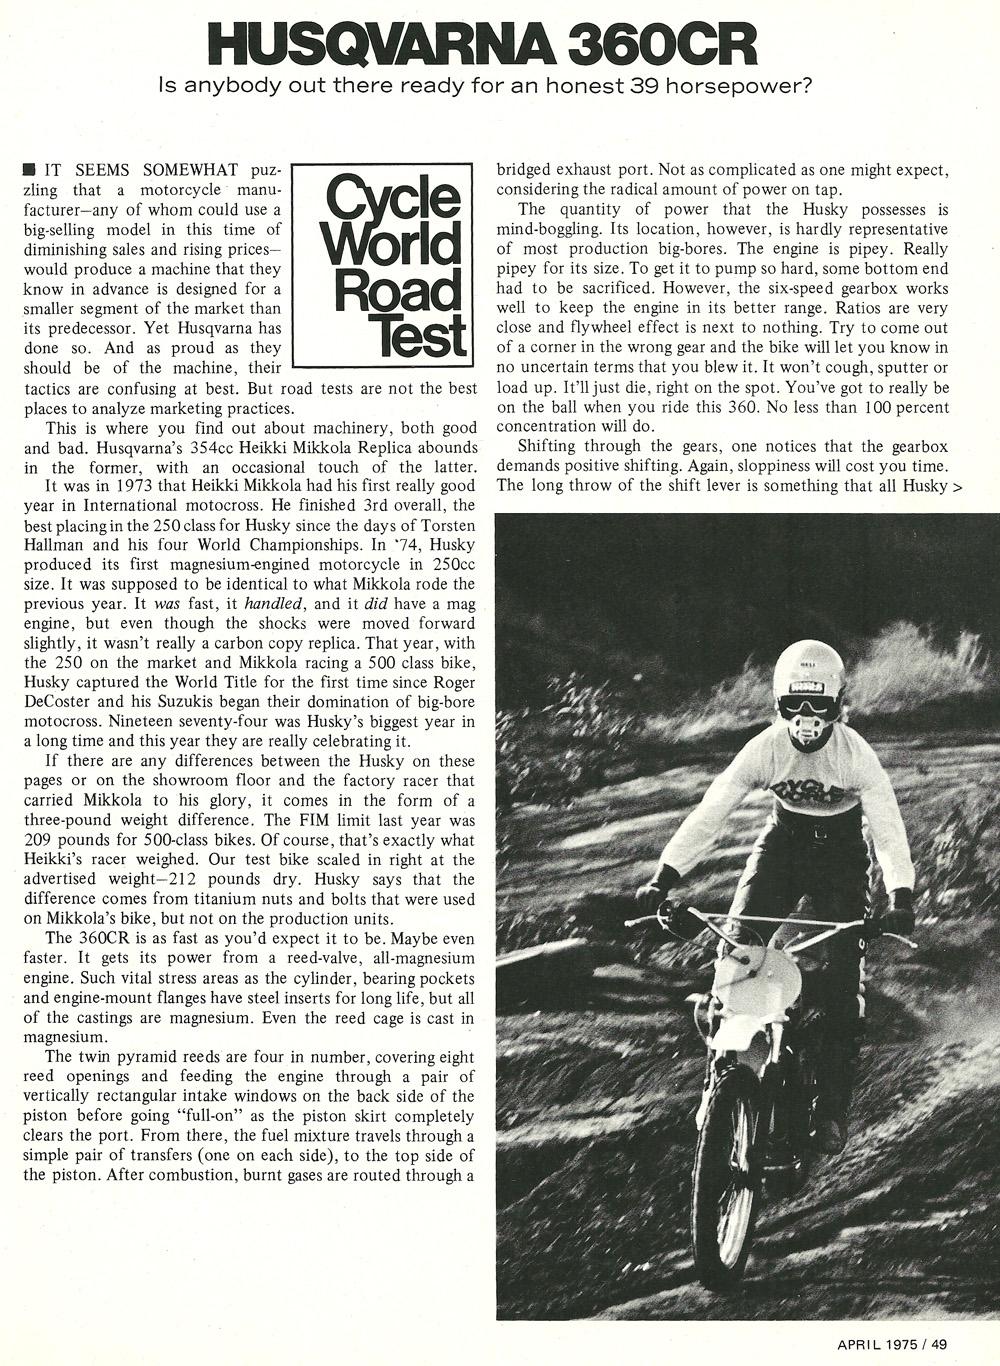 1975 Husqvarna 360CR road test 02.jpg